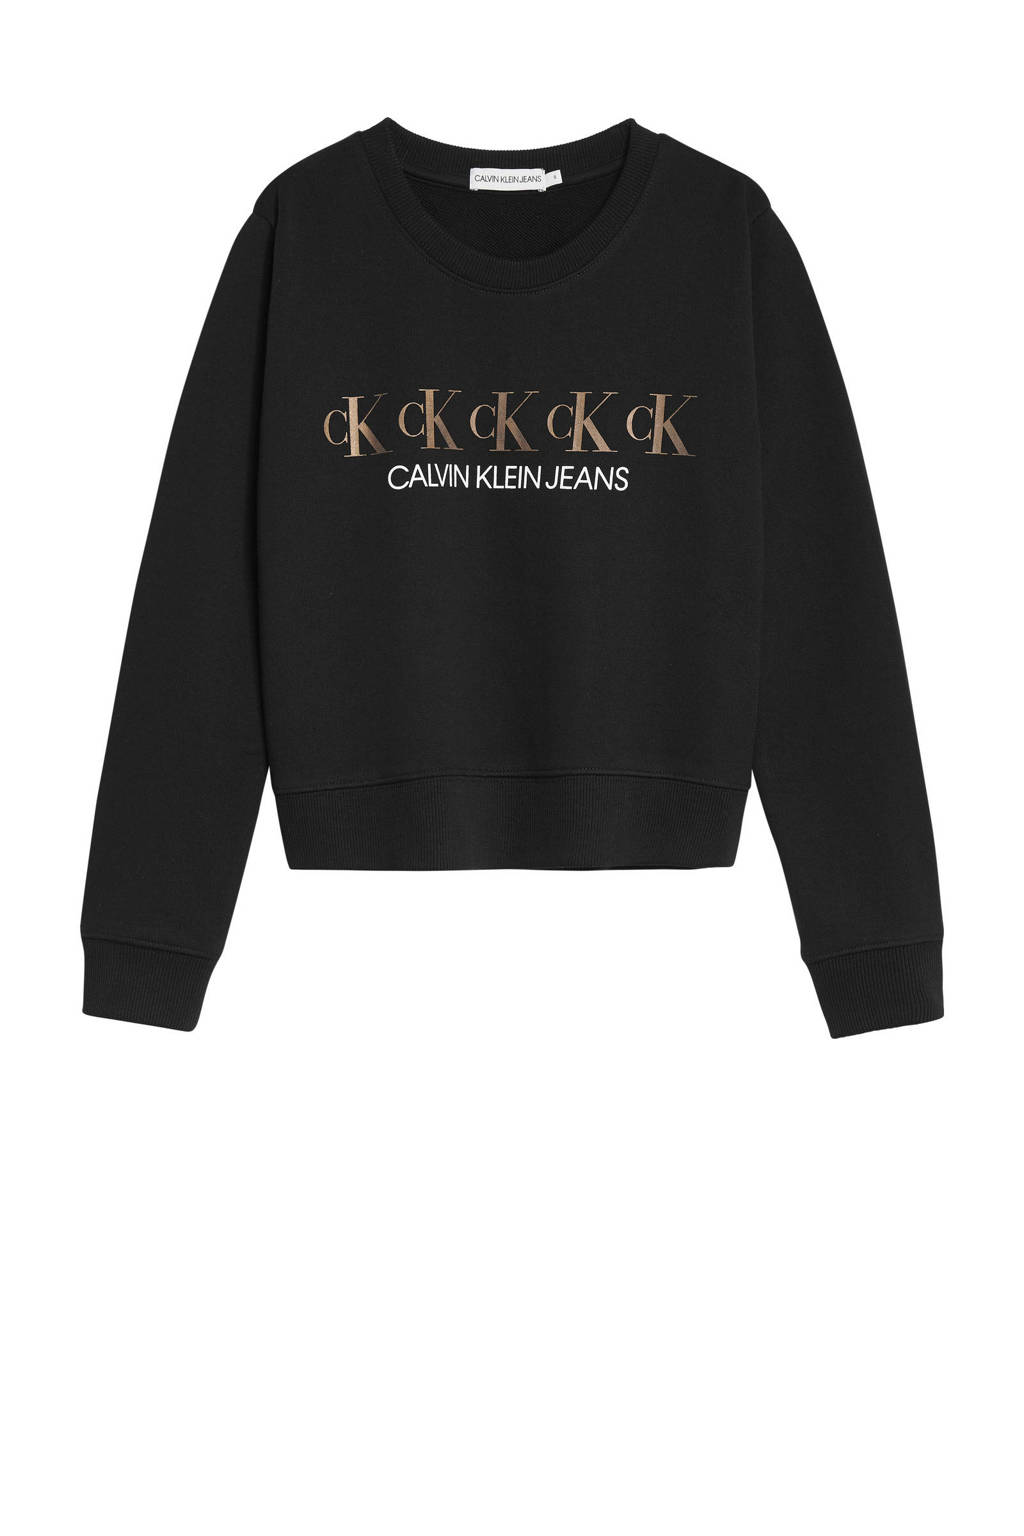 CALVIN KLEIN JEANS sweater met logo zwart/bruin/wit, Zwart/bruin/wit